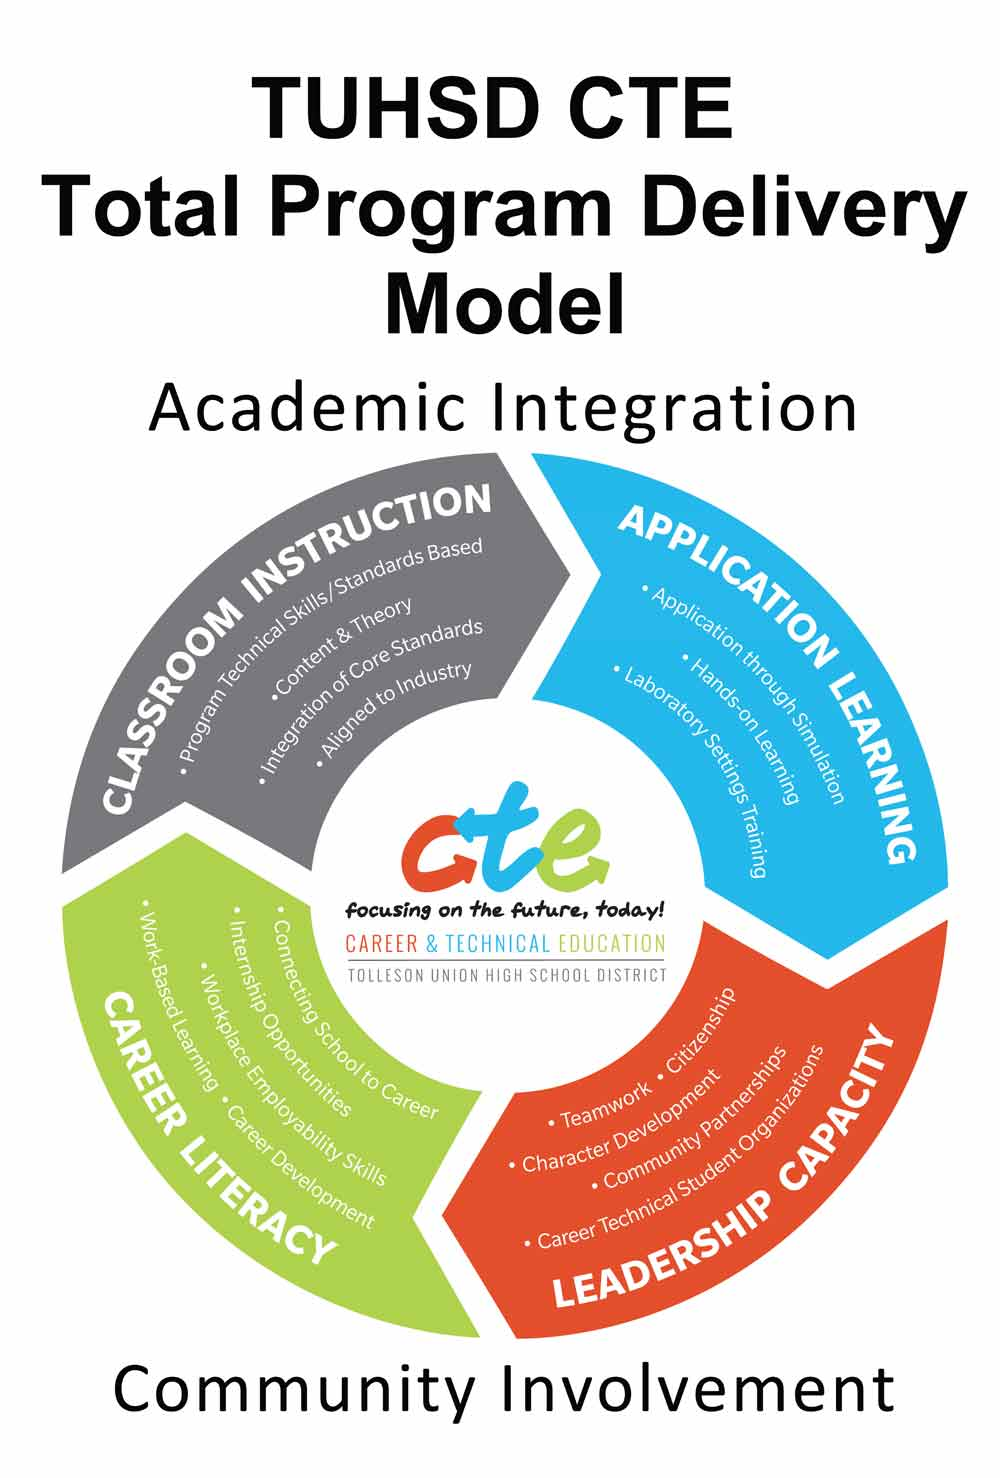 TUHSD CTE Total Program Delivery Model poster